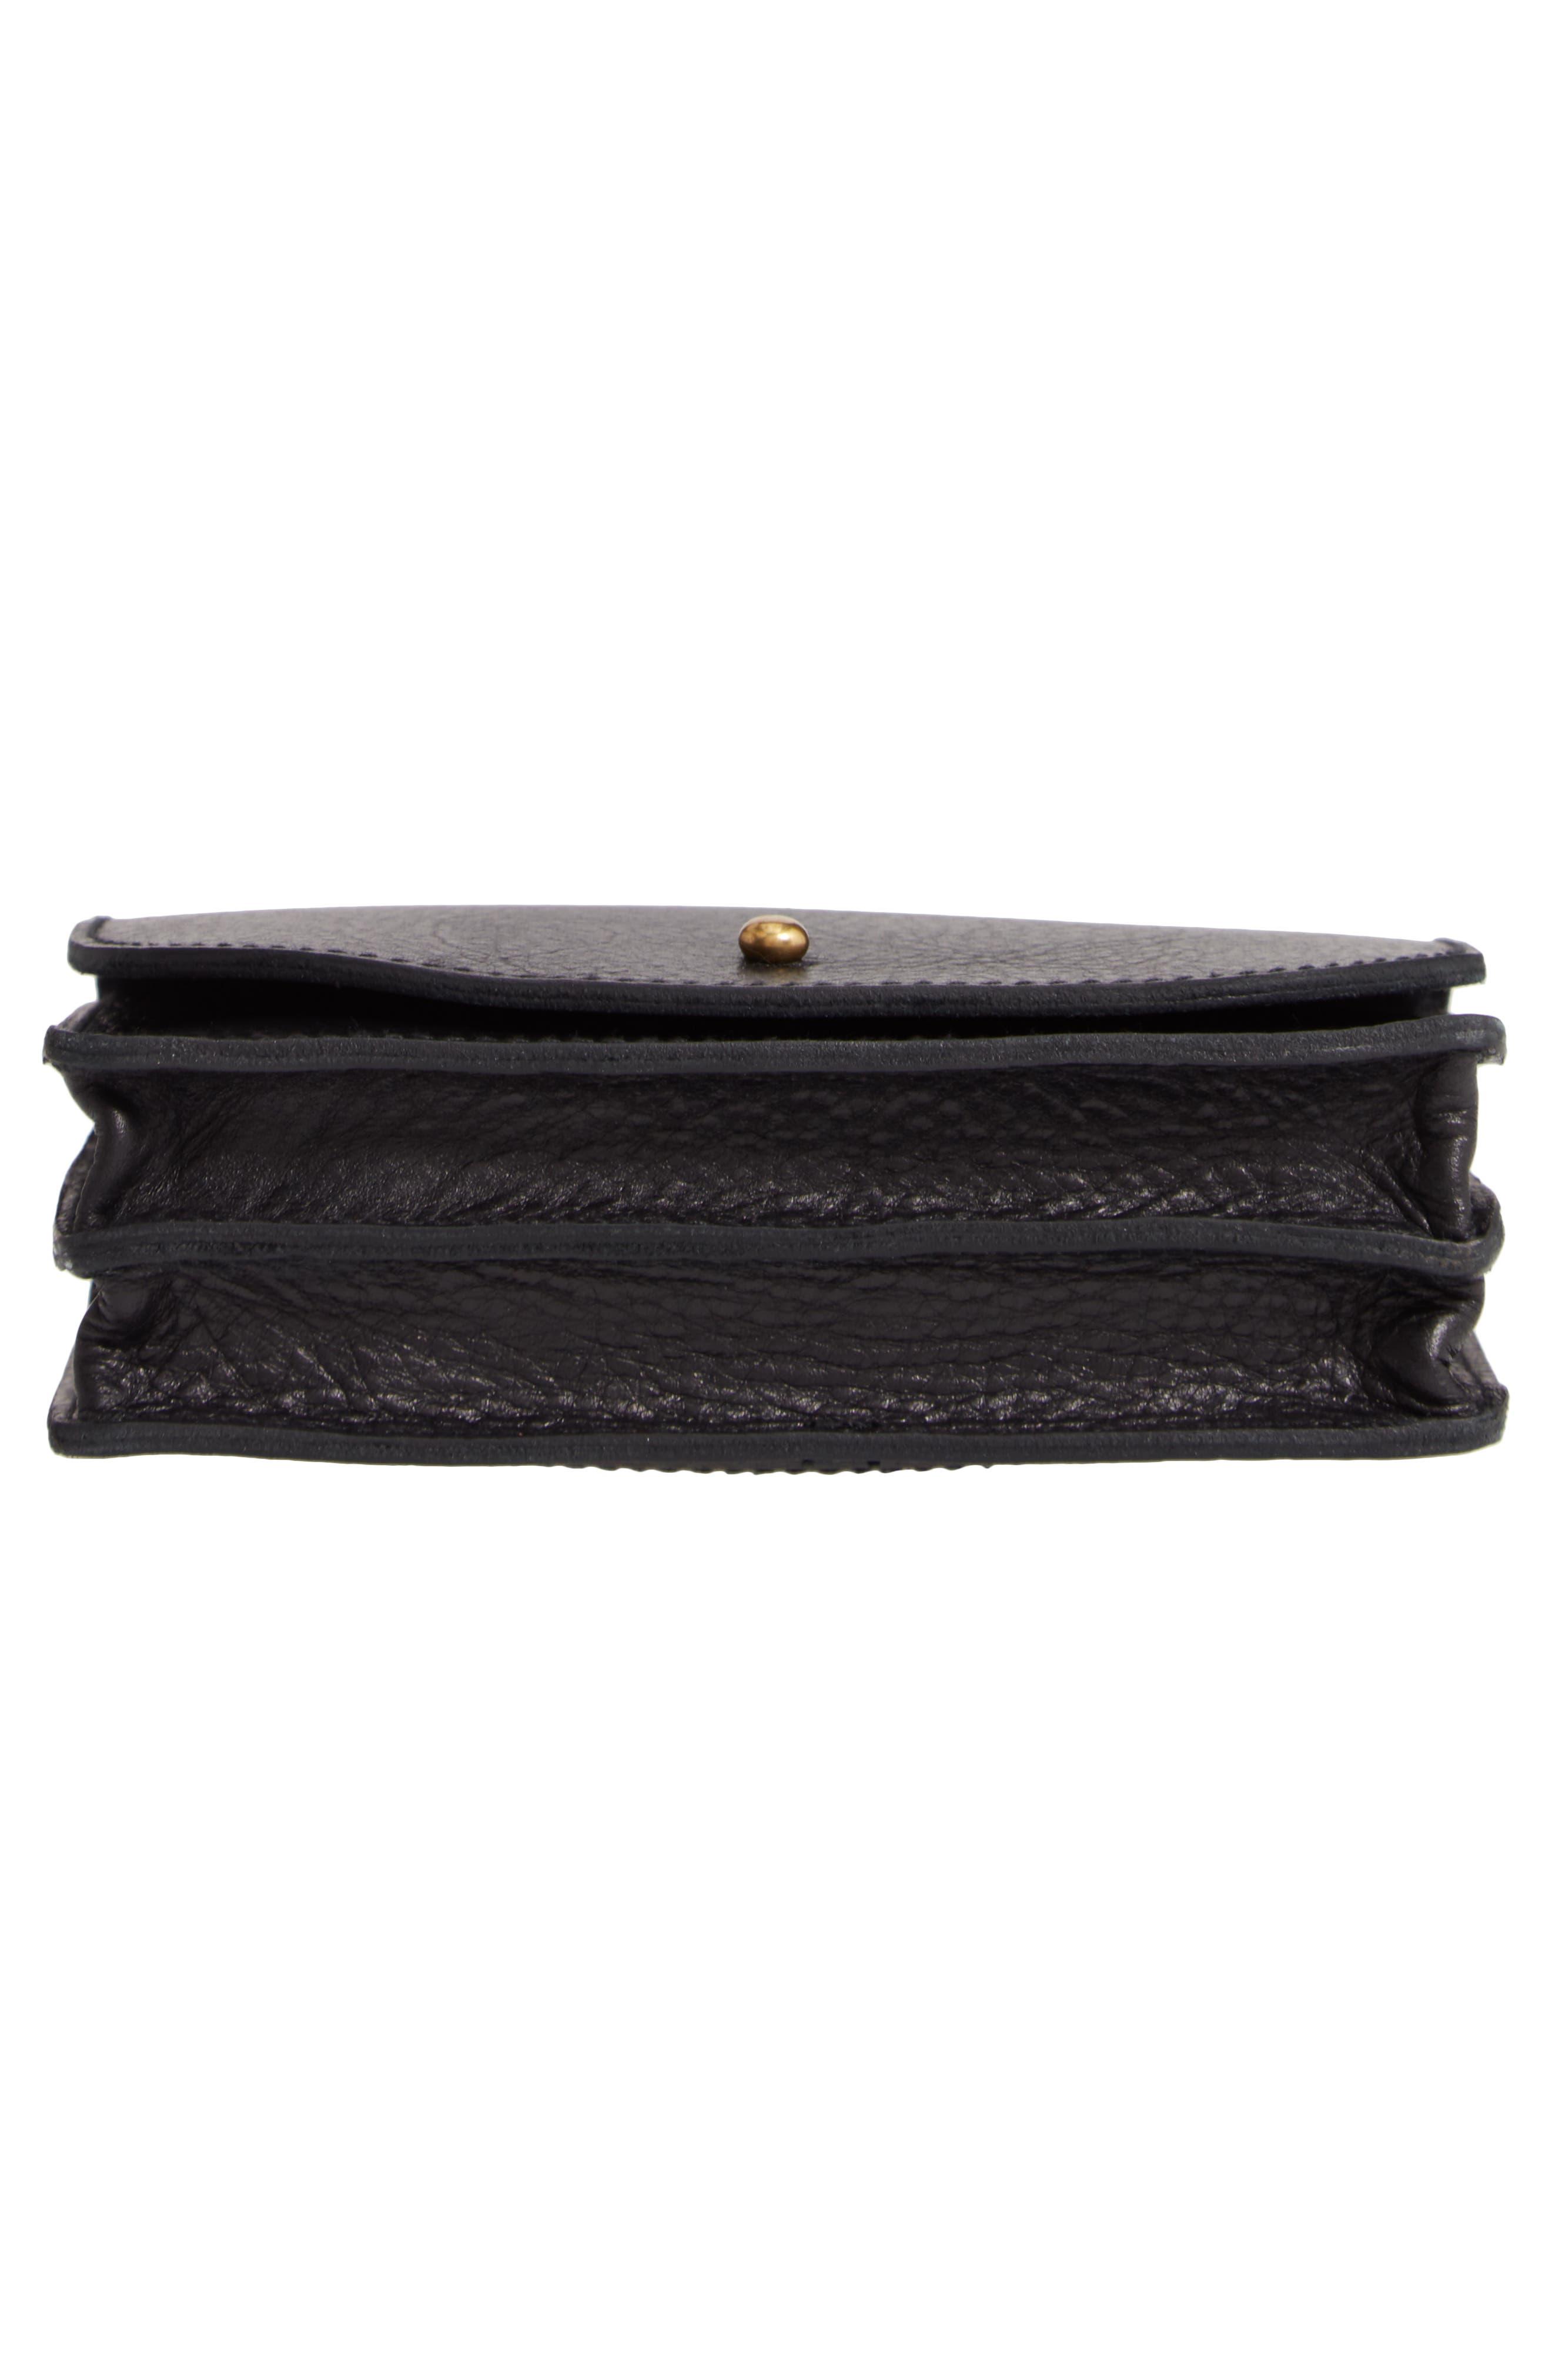 MADEWELL, Leather Crossbody Wallet, Alternate thumbnail 6, color, TRUE BLACK